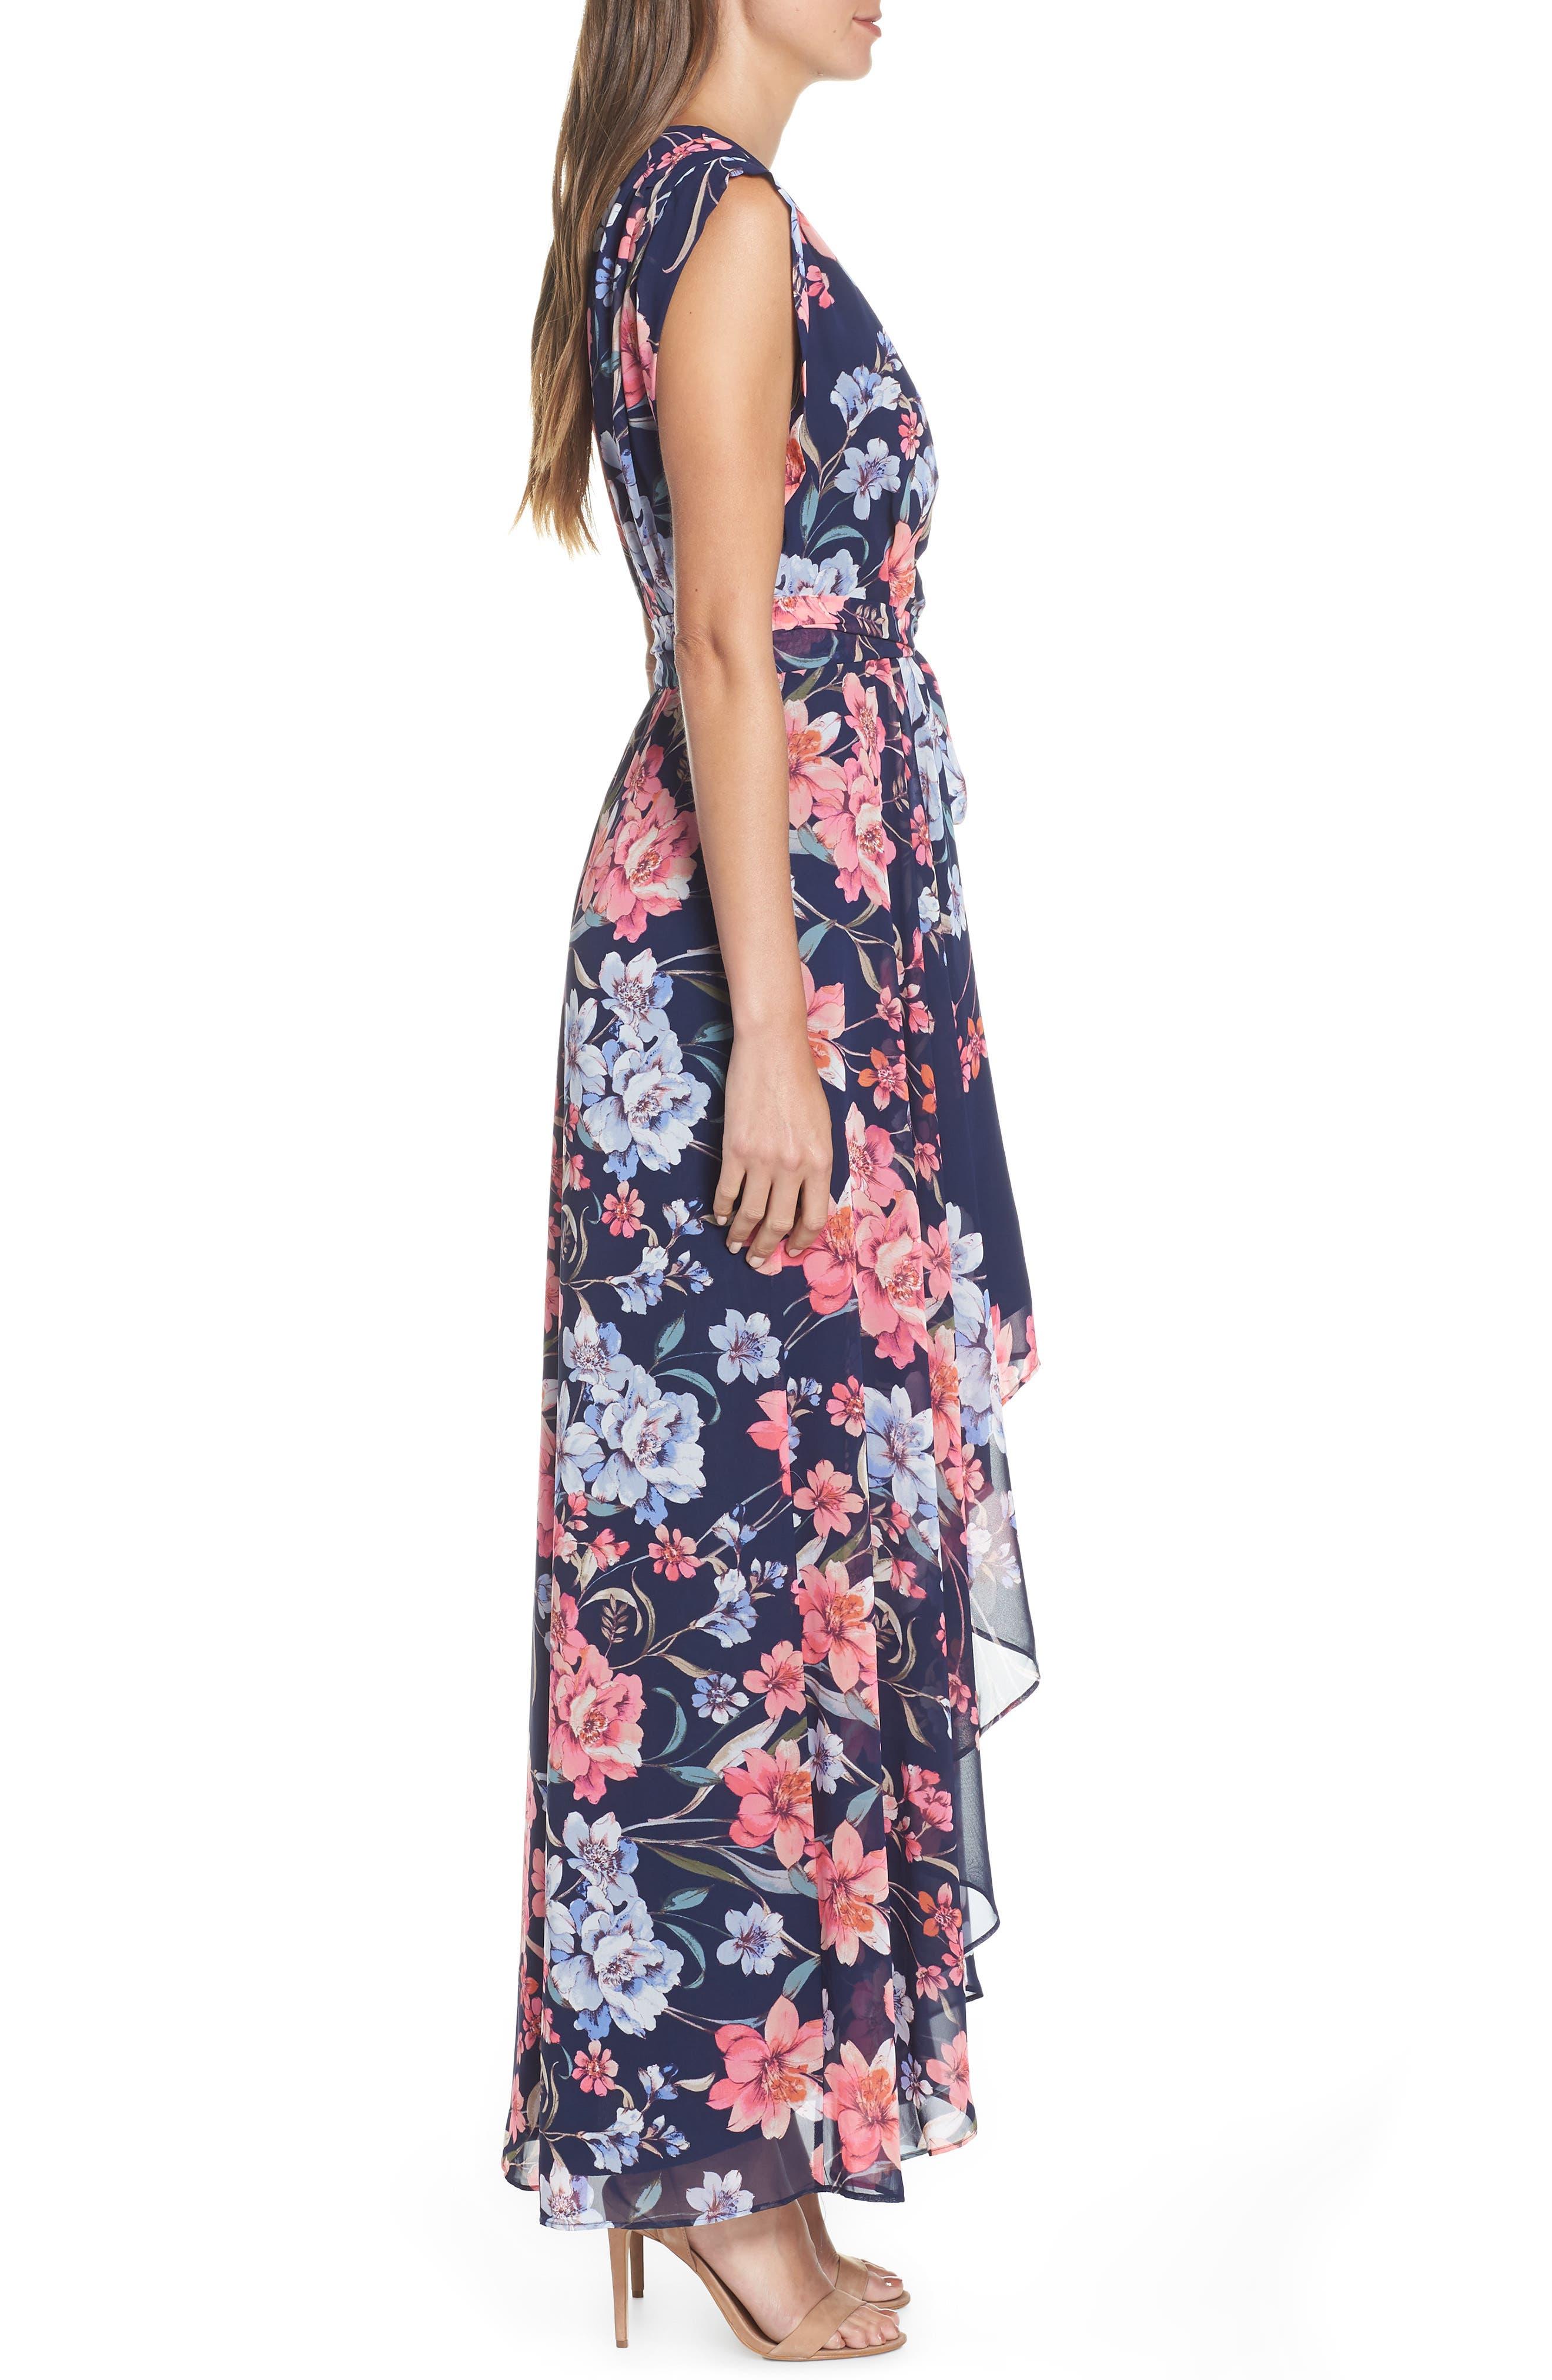 ELIZA J, Floral High/Low Faux Wrap Chiffon Dress, Alternate thumbnail 4, color, NAVY